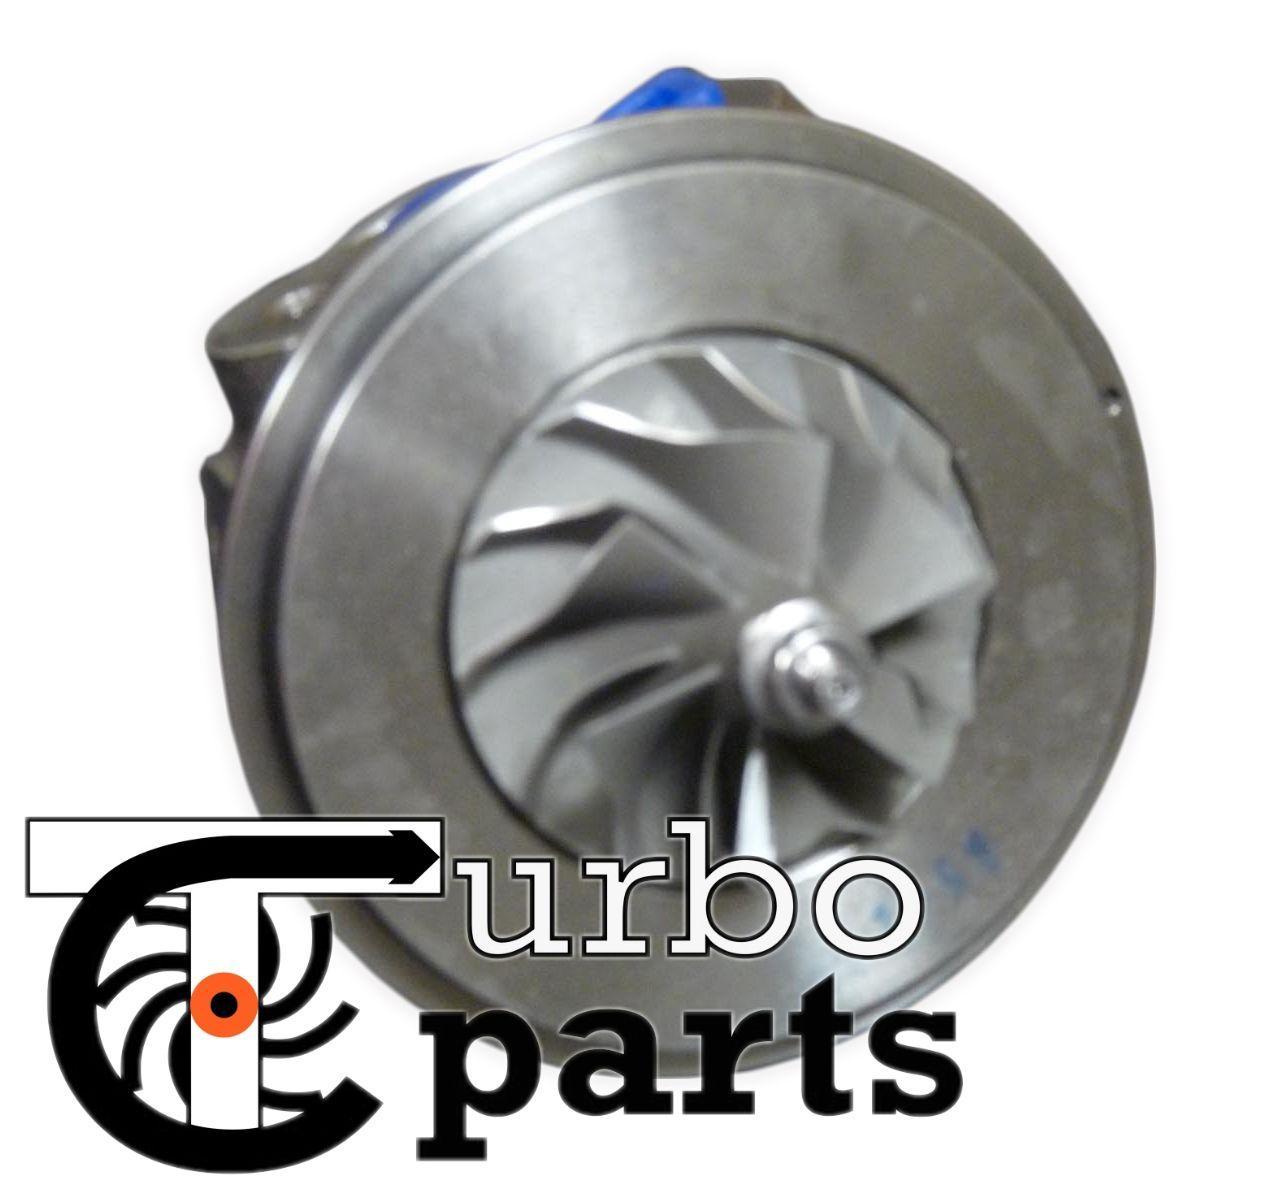 Картридж турбины Hyundai H-1 2.5 TD от 2000 г.в. - 49135-02100, 49135-02110, 49135-02400, 49135-02600